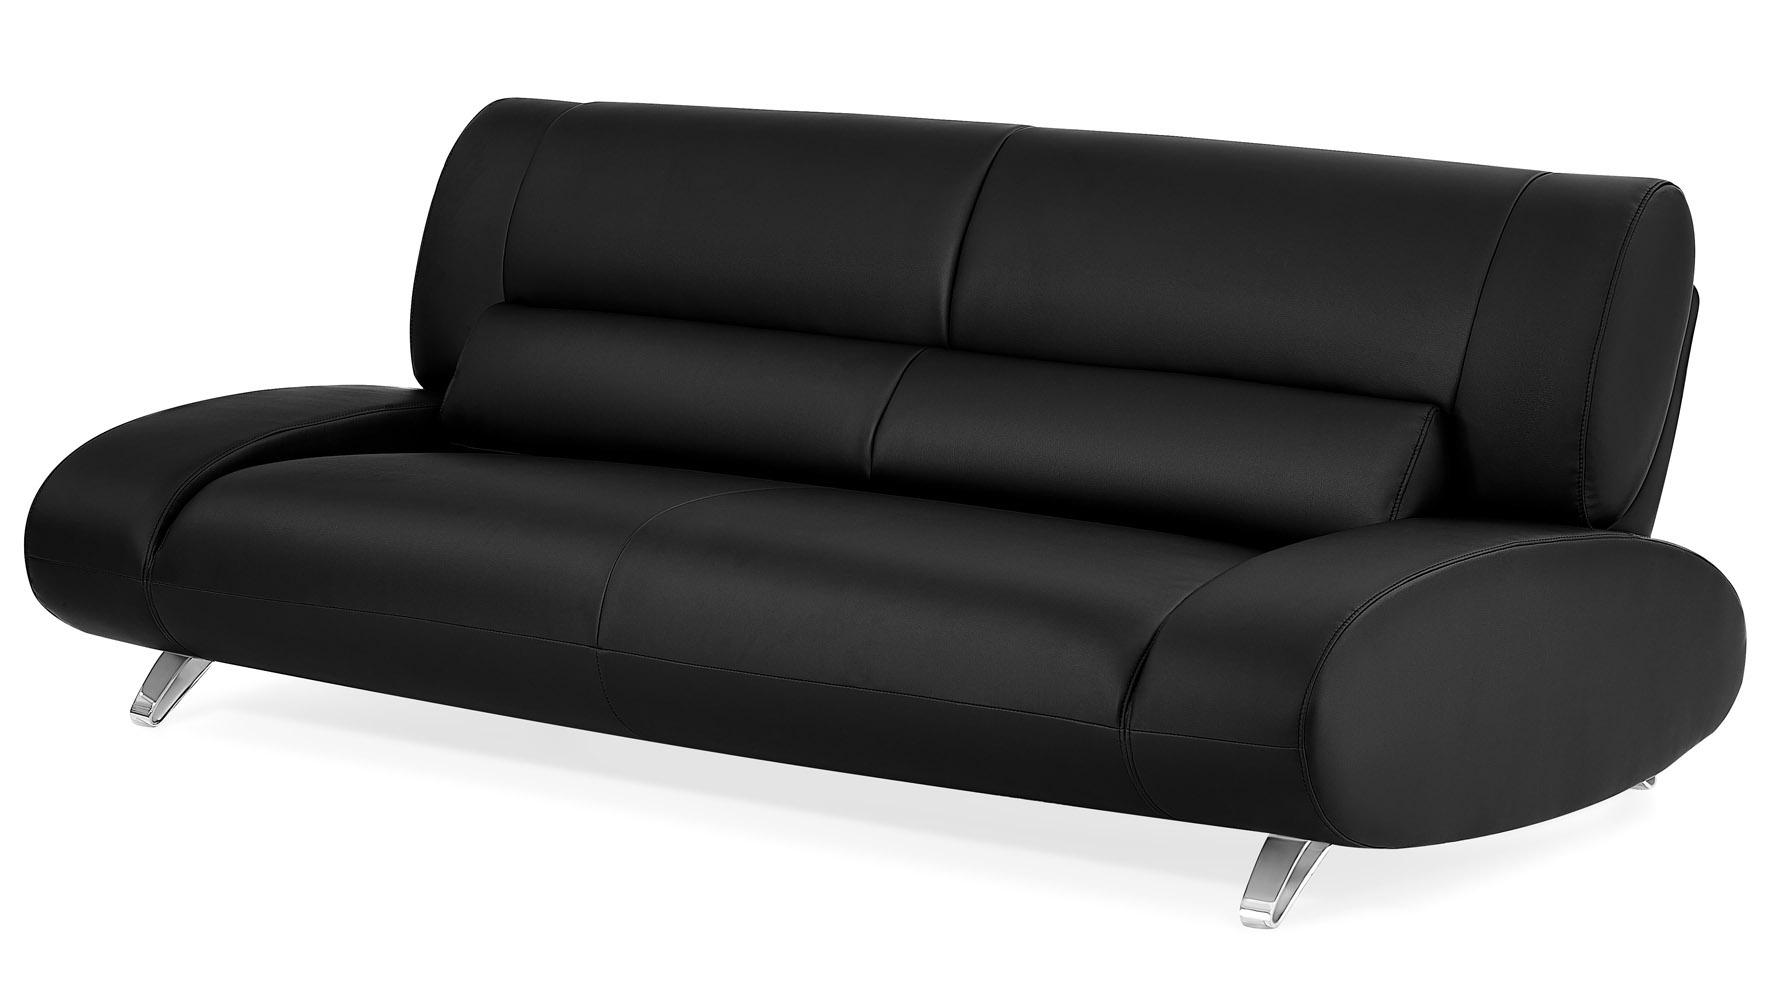 Aspen Sofa For Aspen Leather Sofas (View 4 of 15)